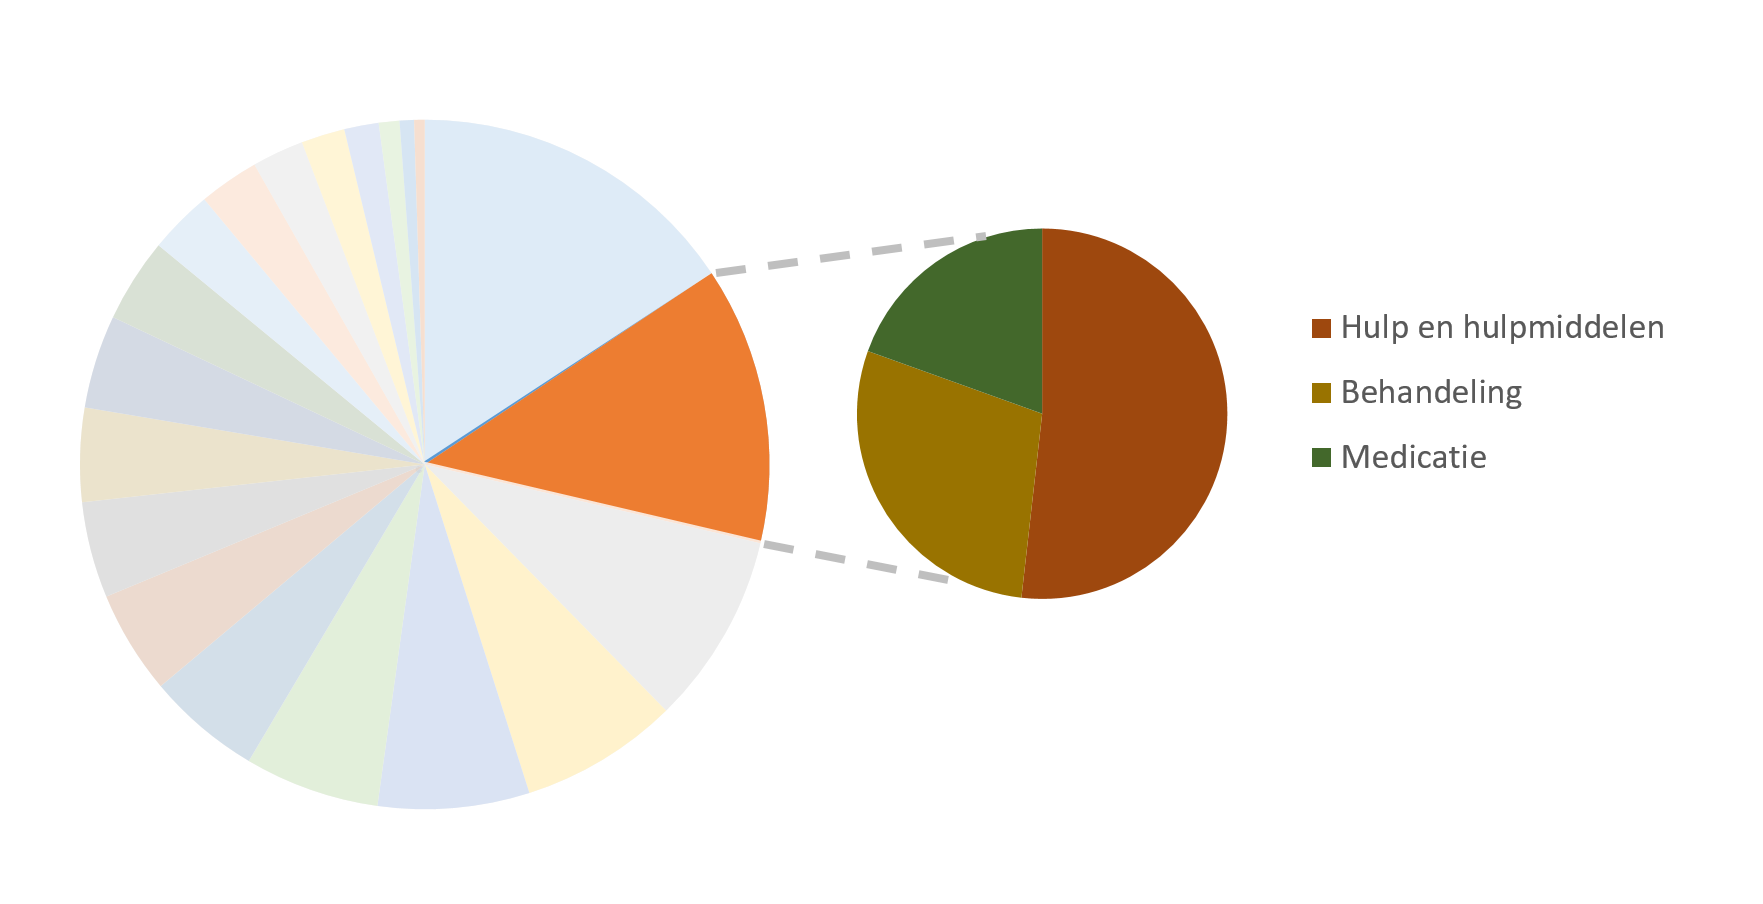 Taartdiagram subthemas